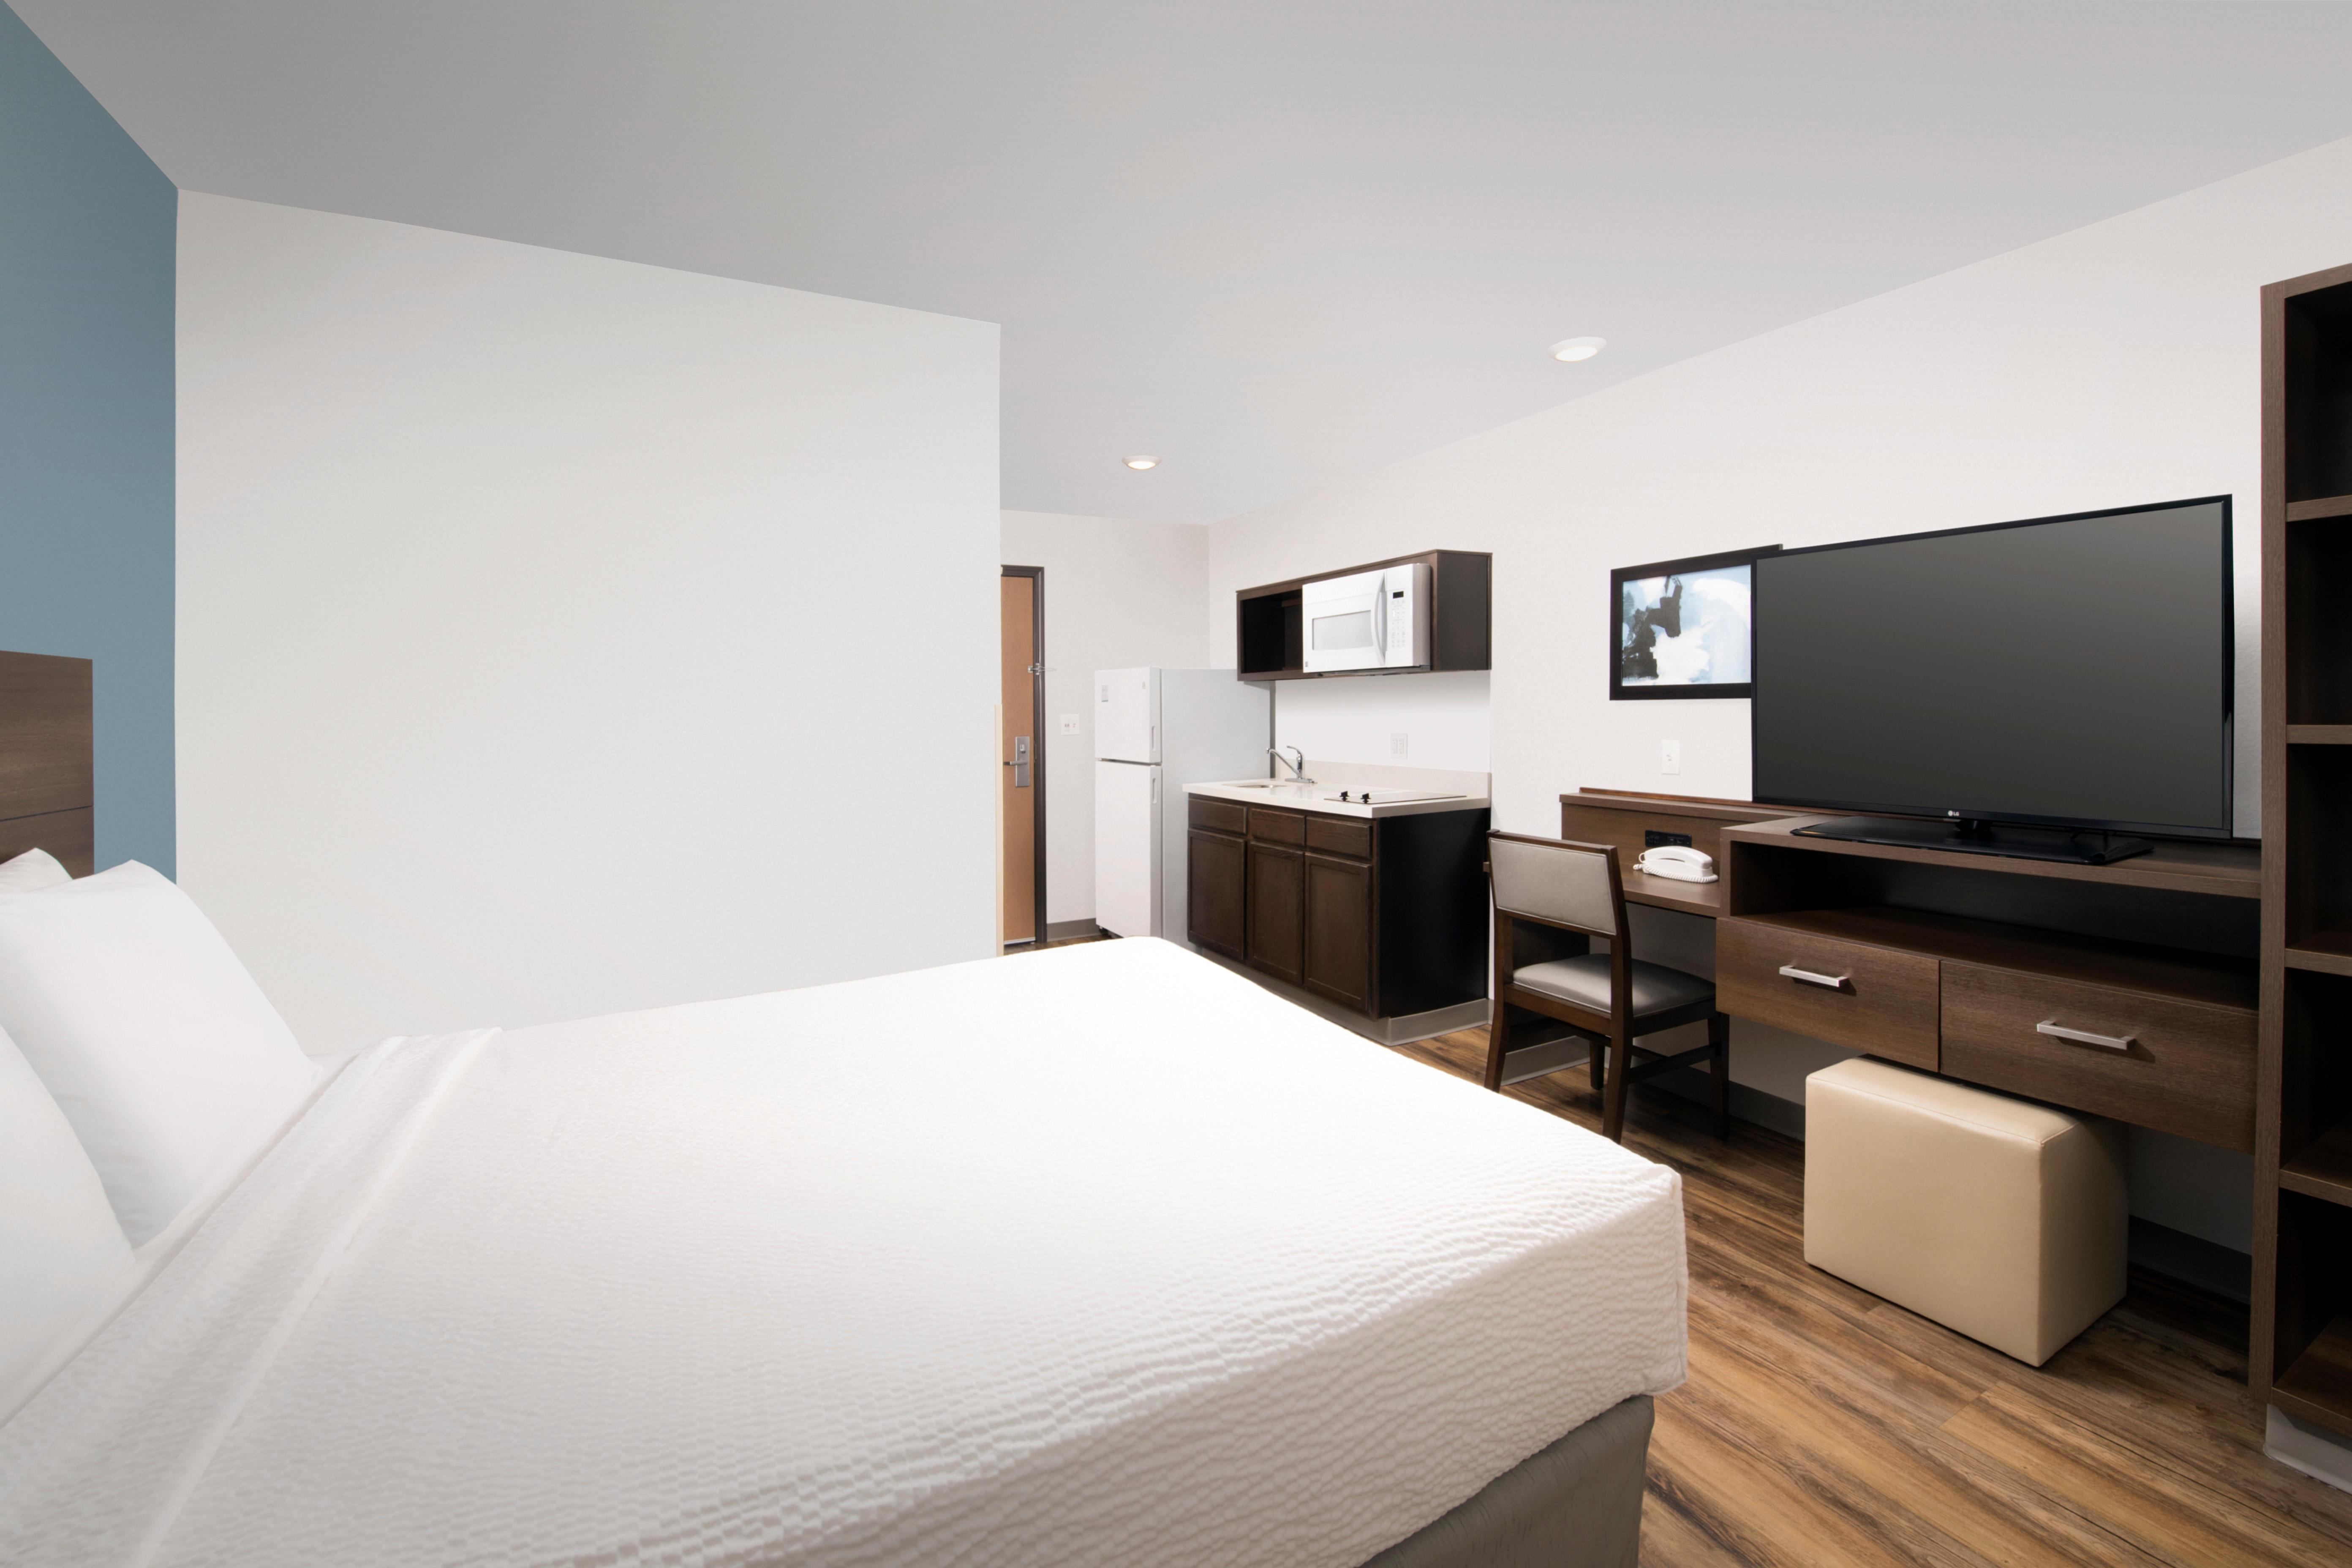 WoodSpring Suites Clearwater image 13